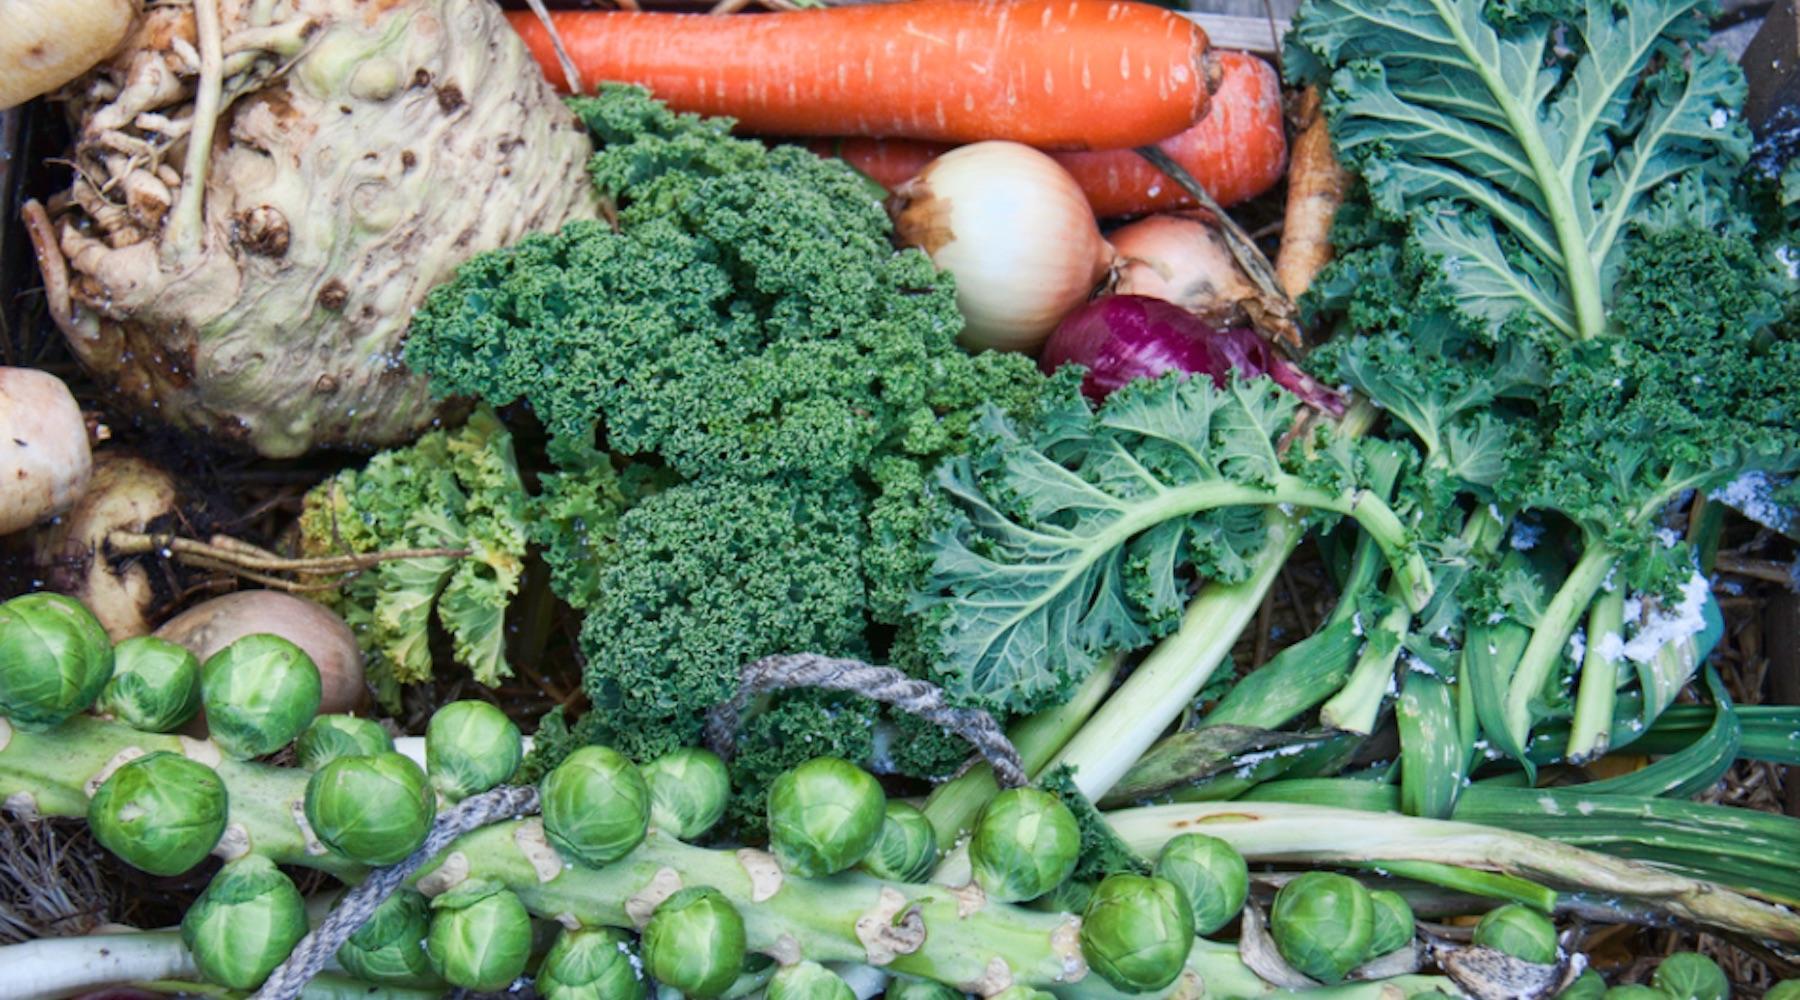 veggies-1507660961000-1507660965553.jpg